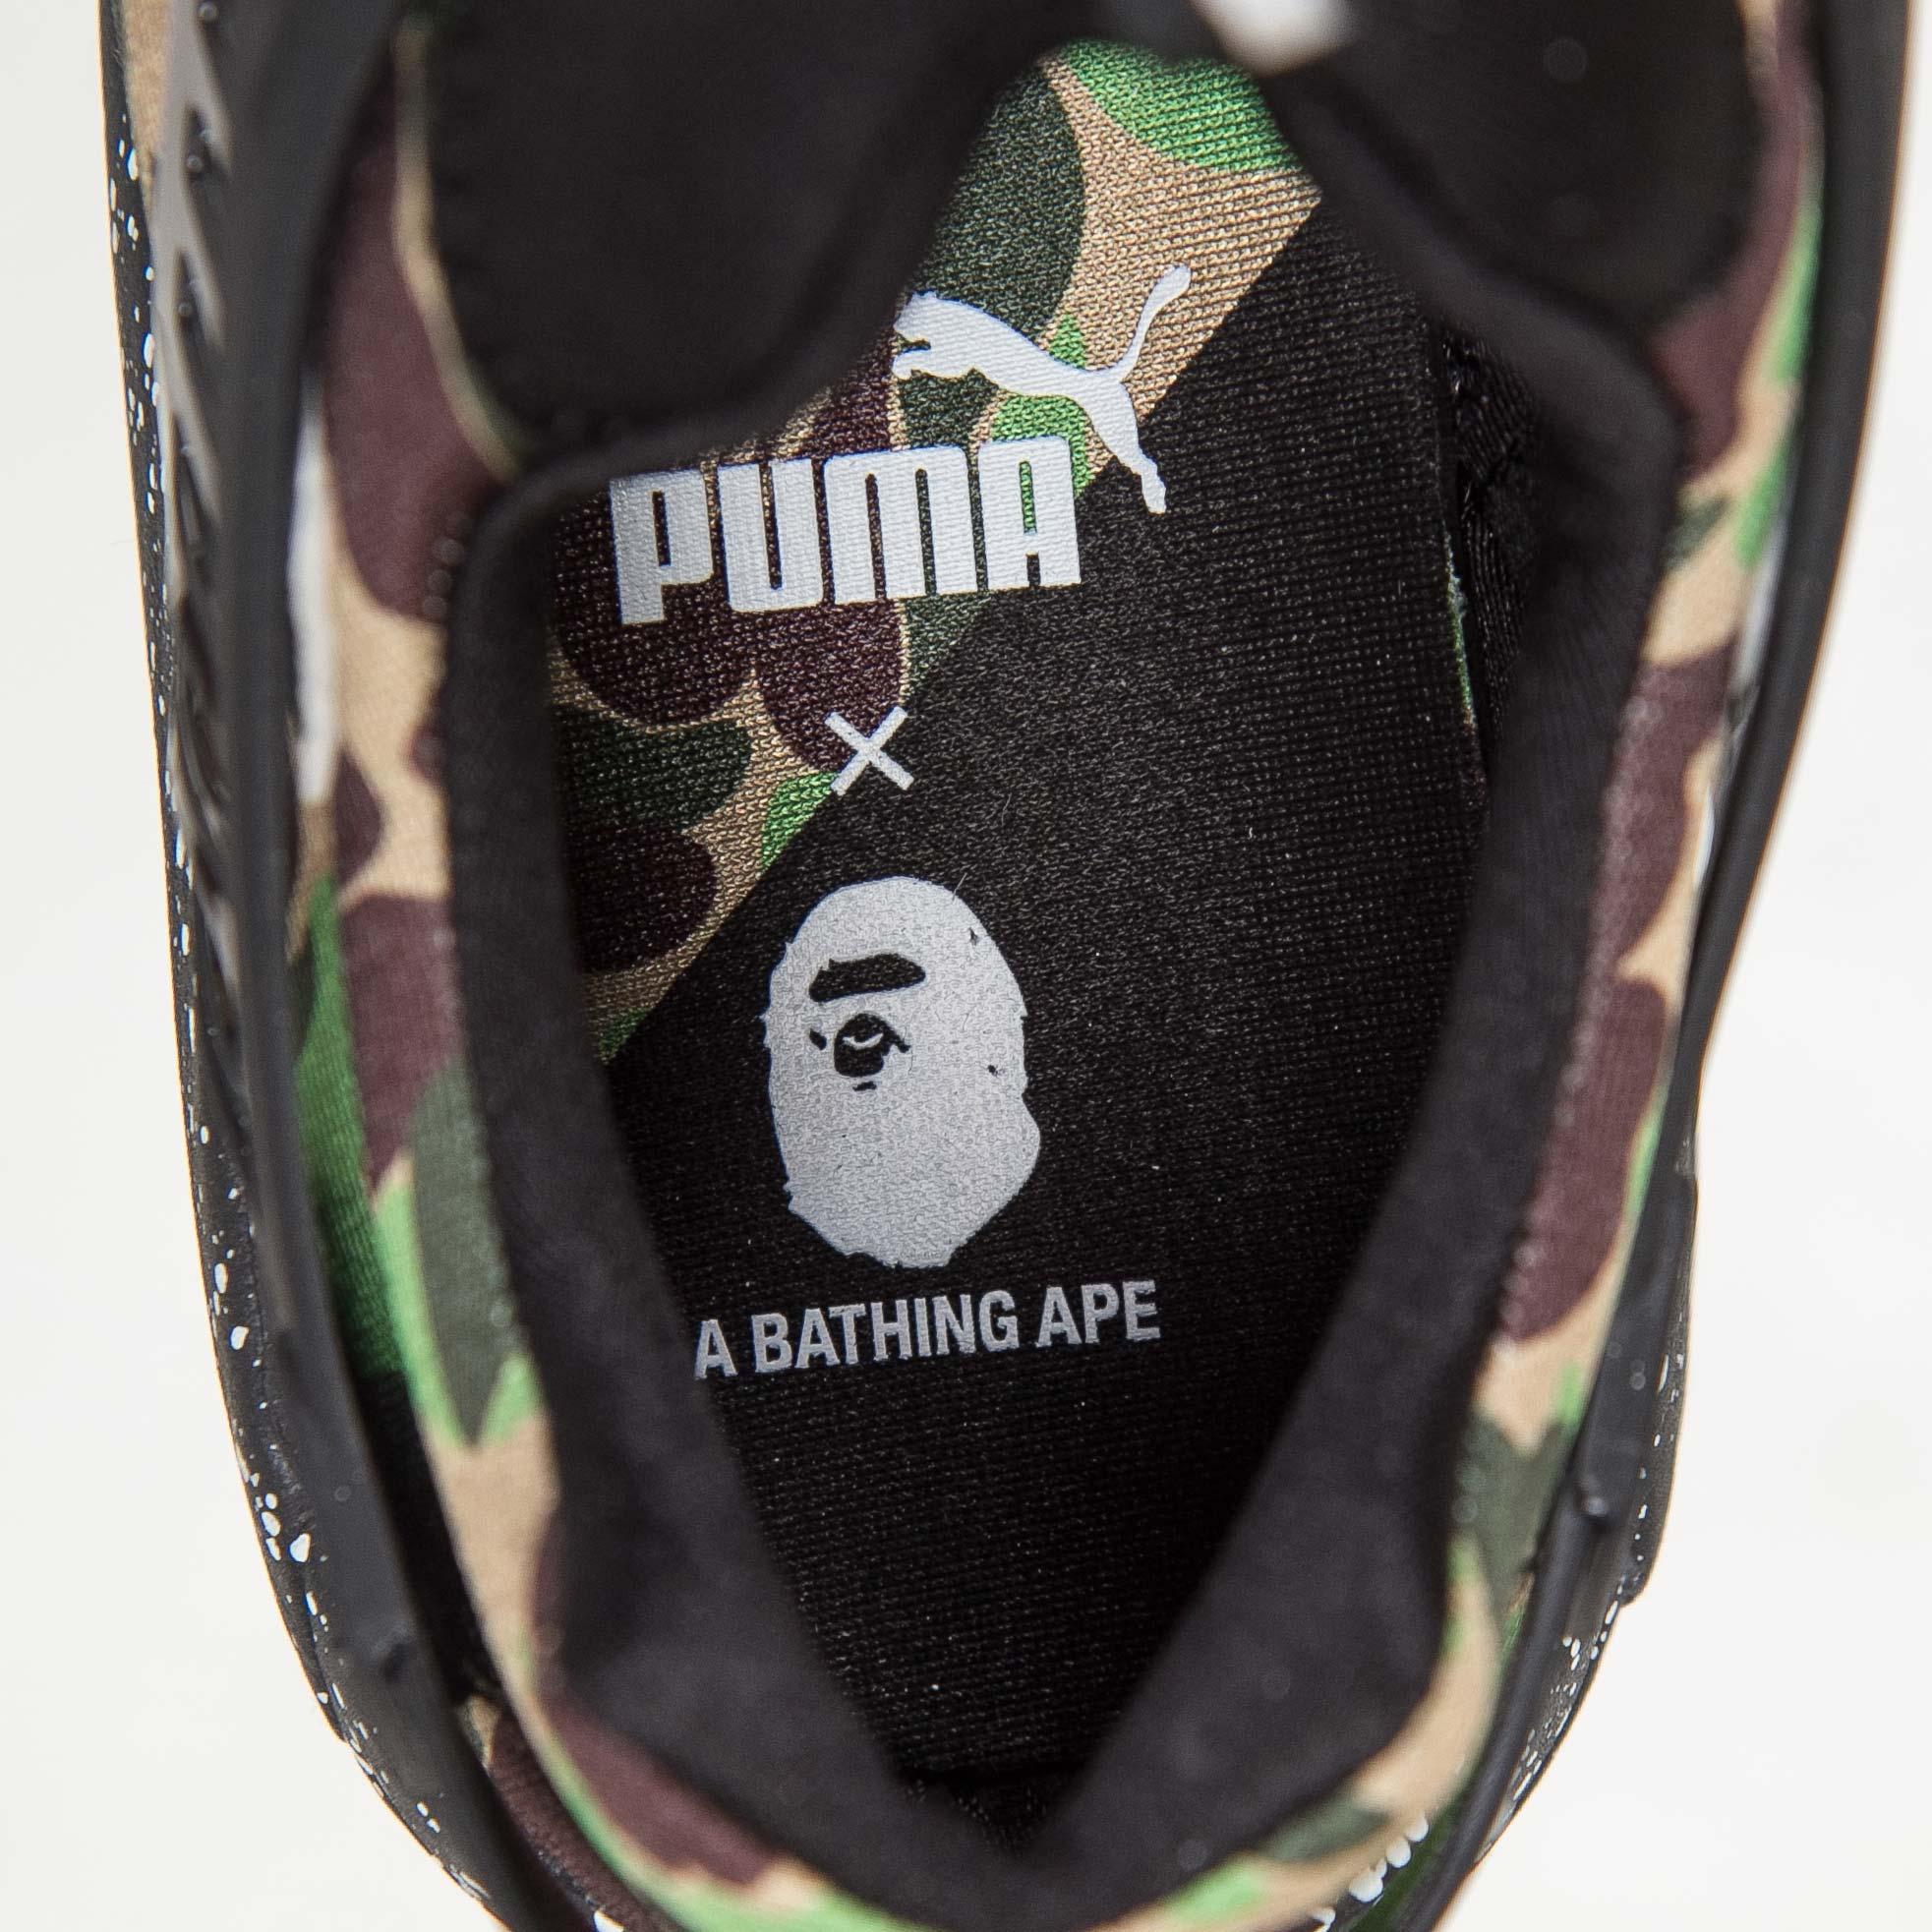 67afc3e690b7 Puma Disc Blaze x Bape - 358846-01 - Sneakersnstuff